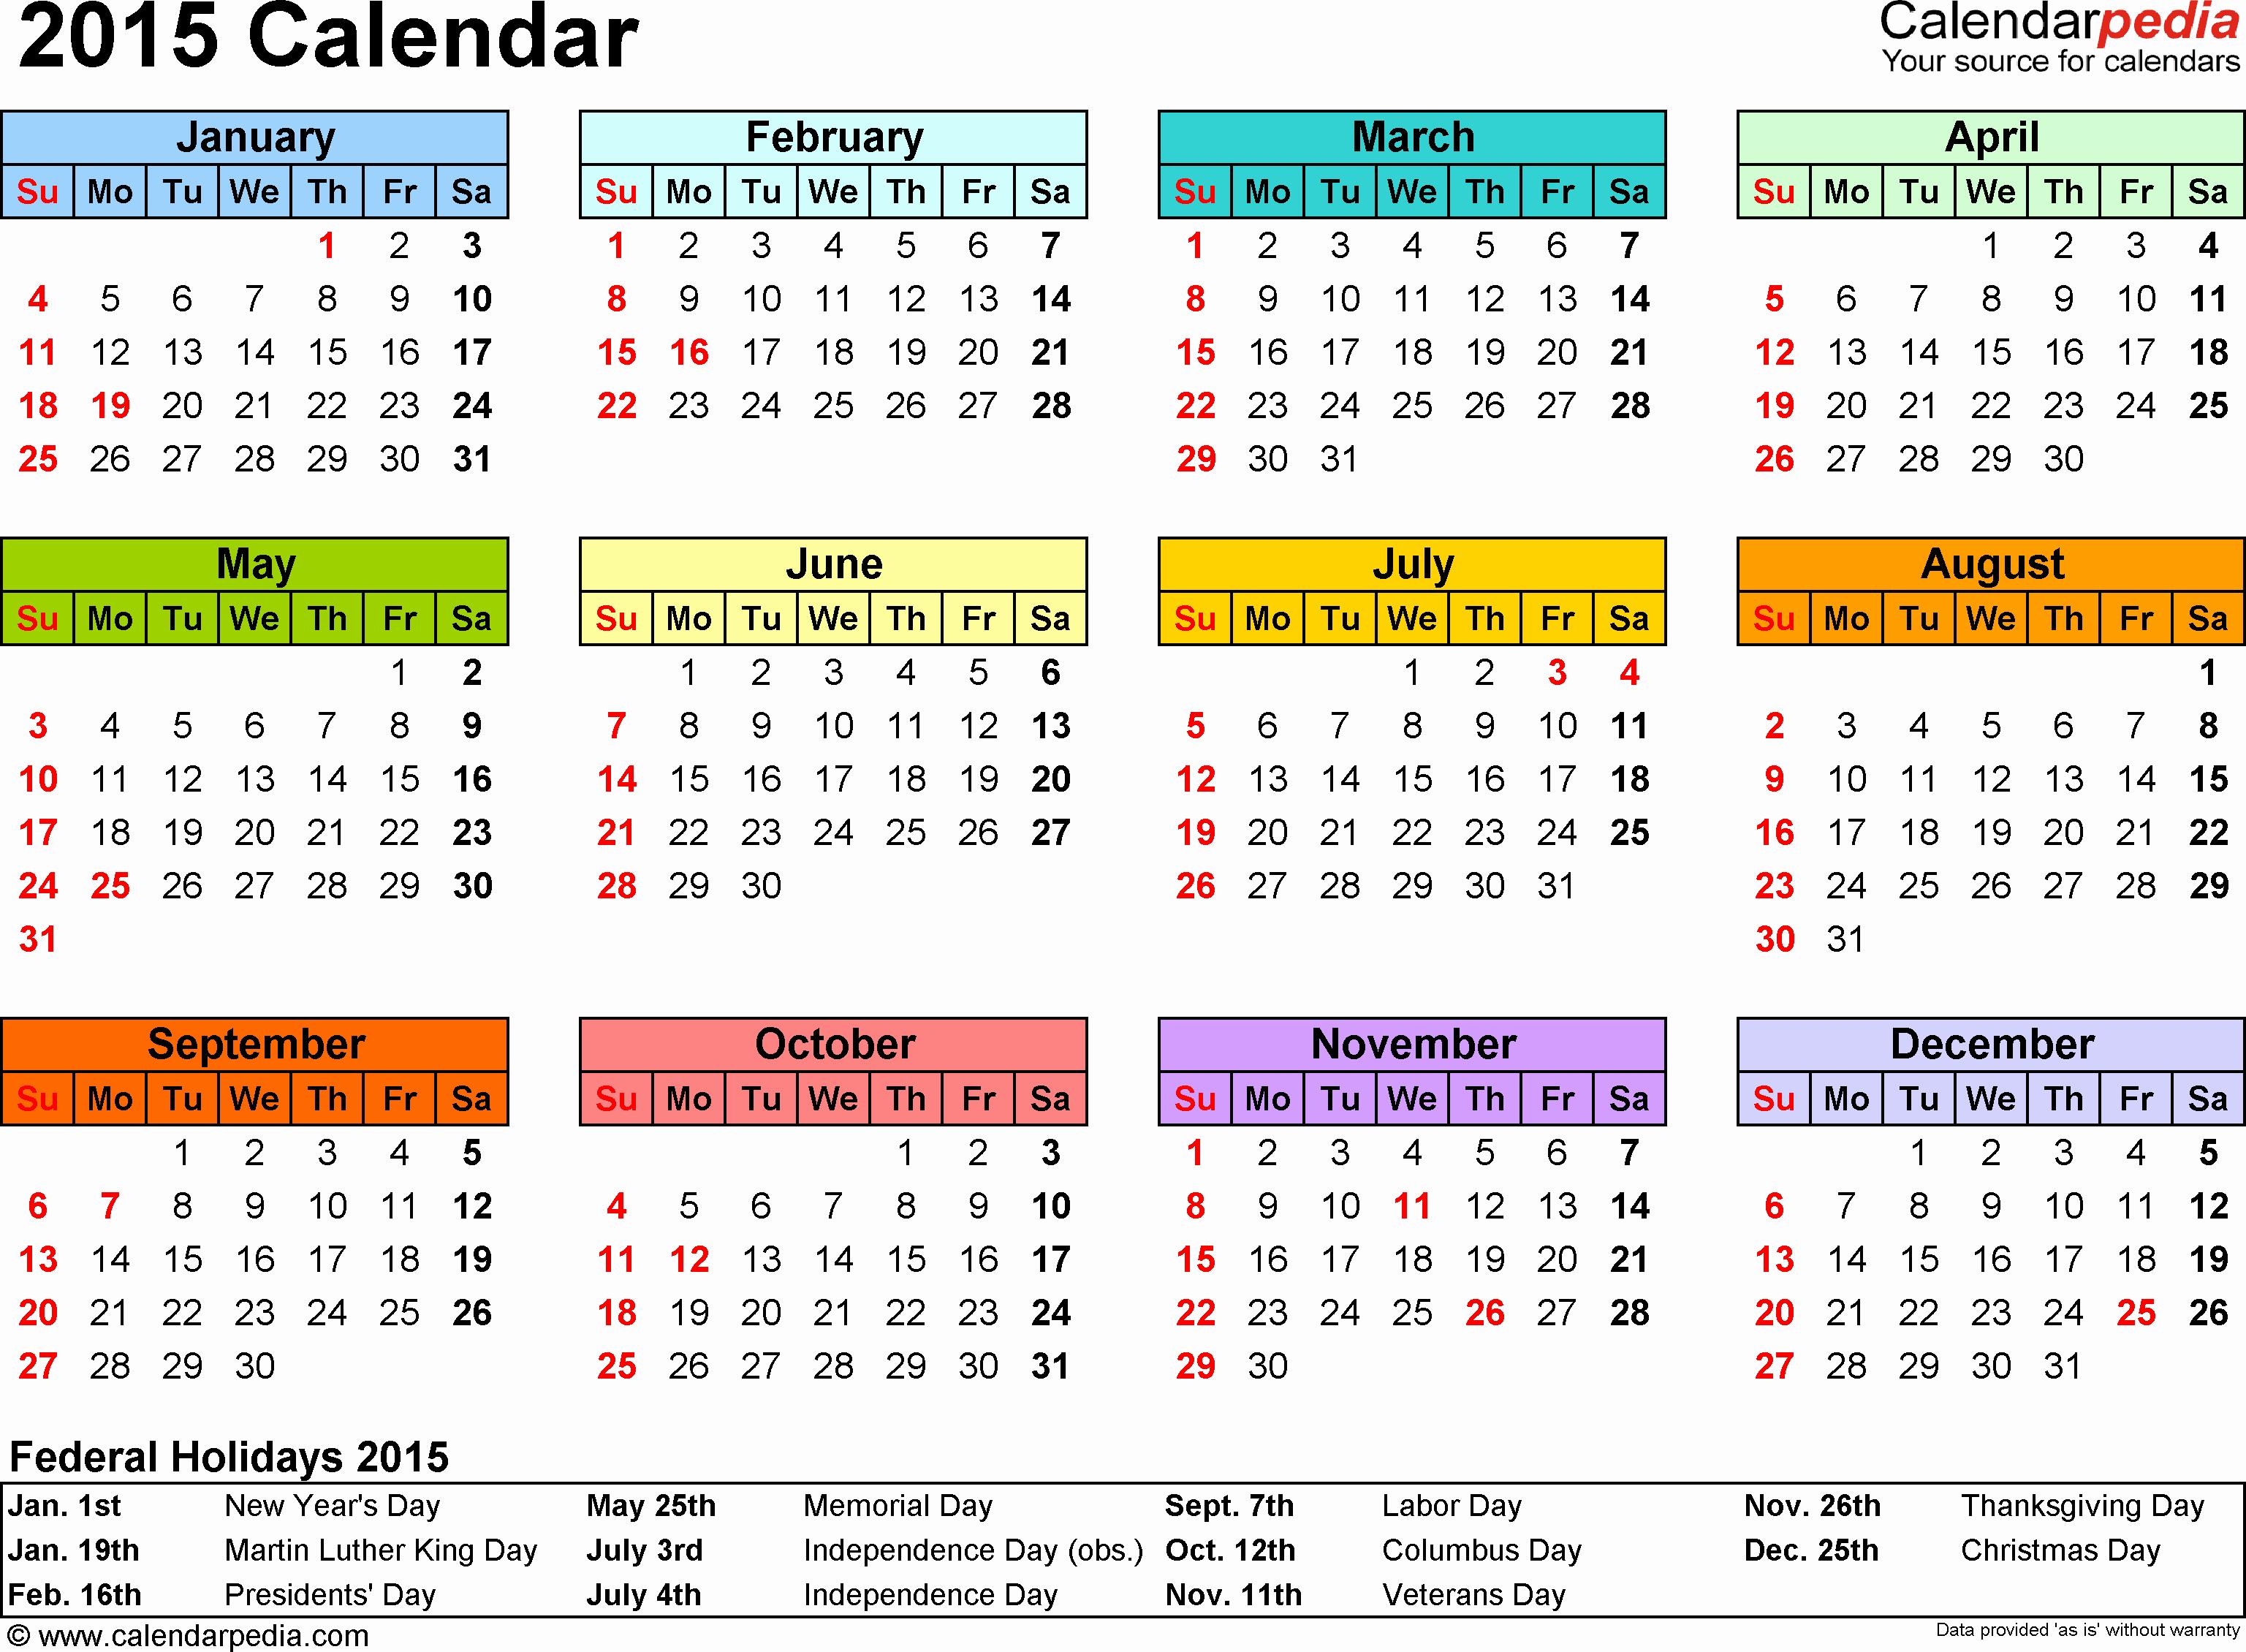 Marketing Calendar Template Excel 2015 Elegant 2015 Calendar Excel Download 16 Free Printable Templates